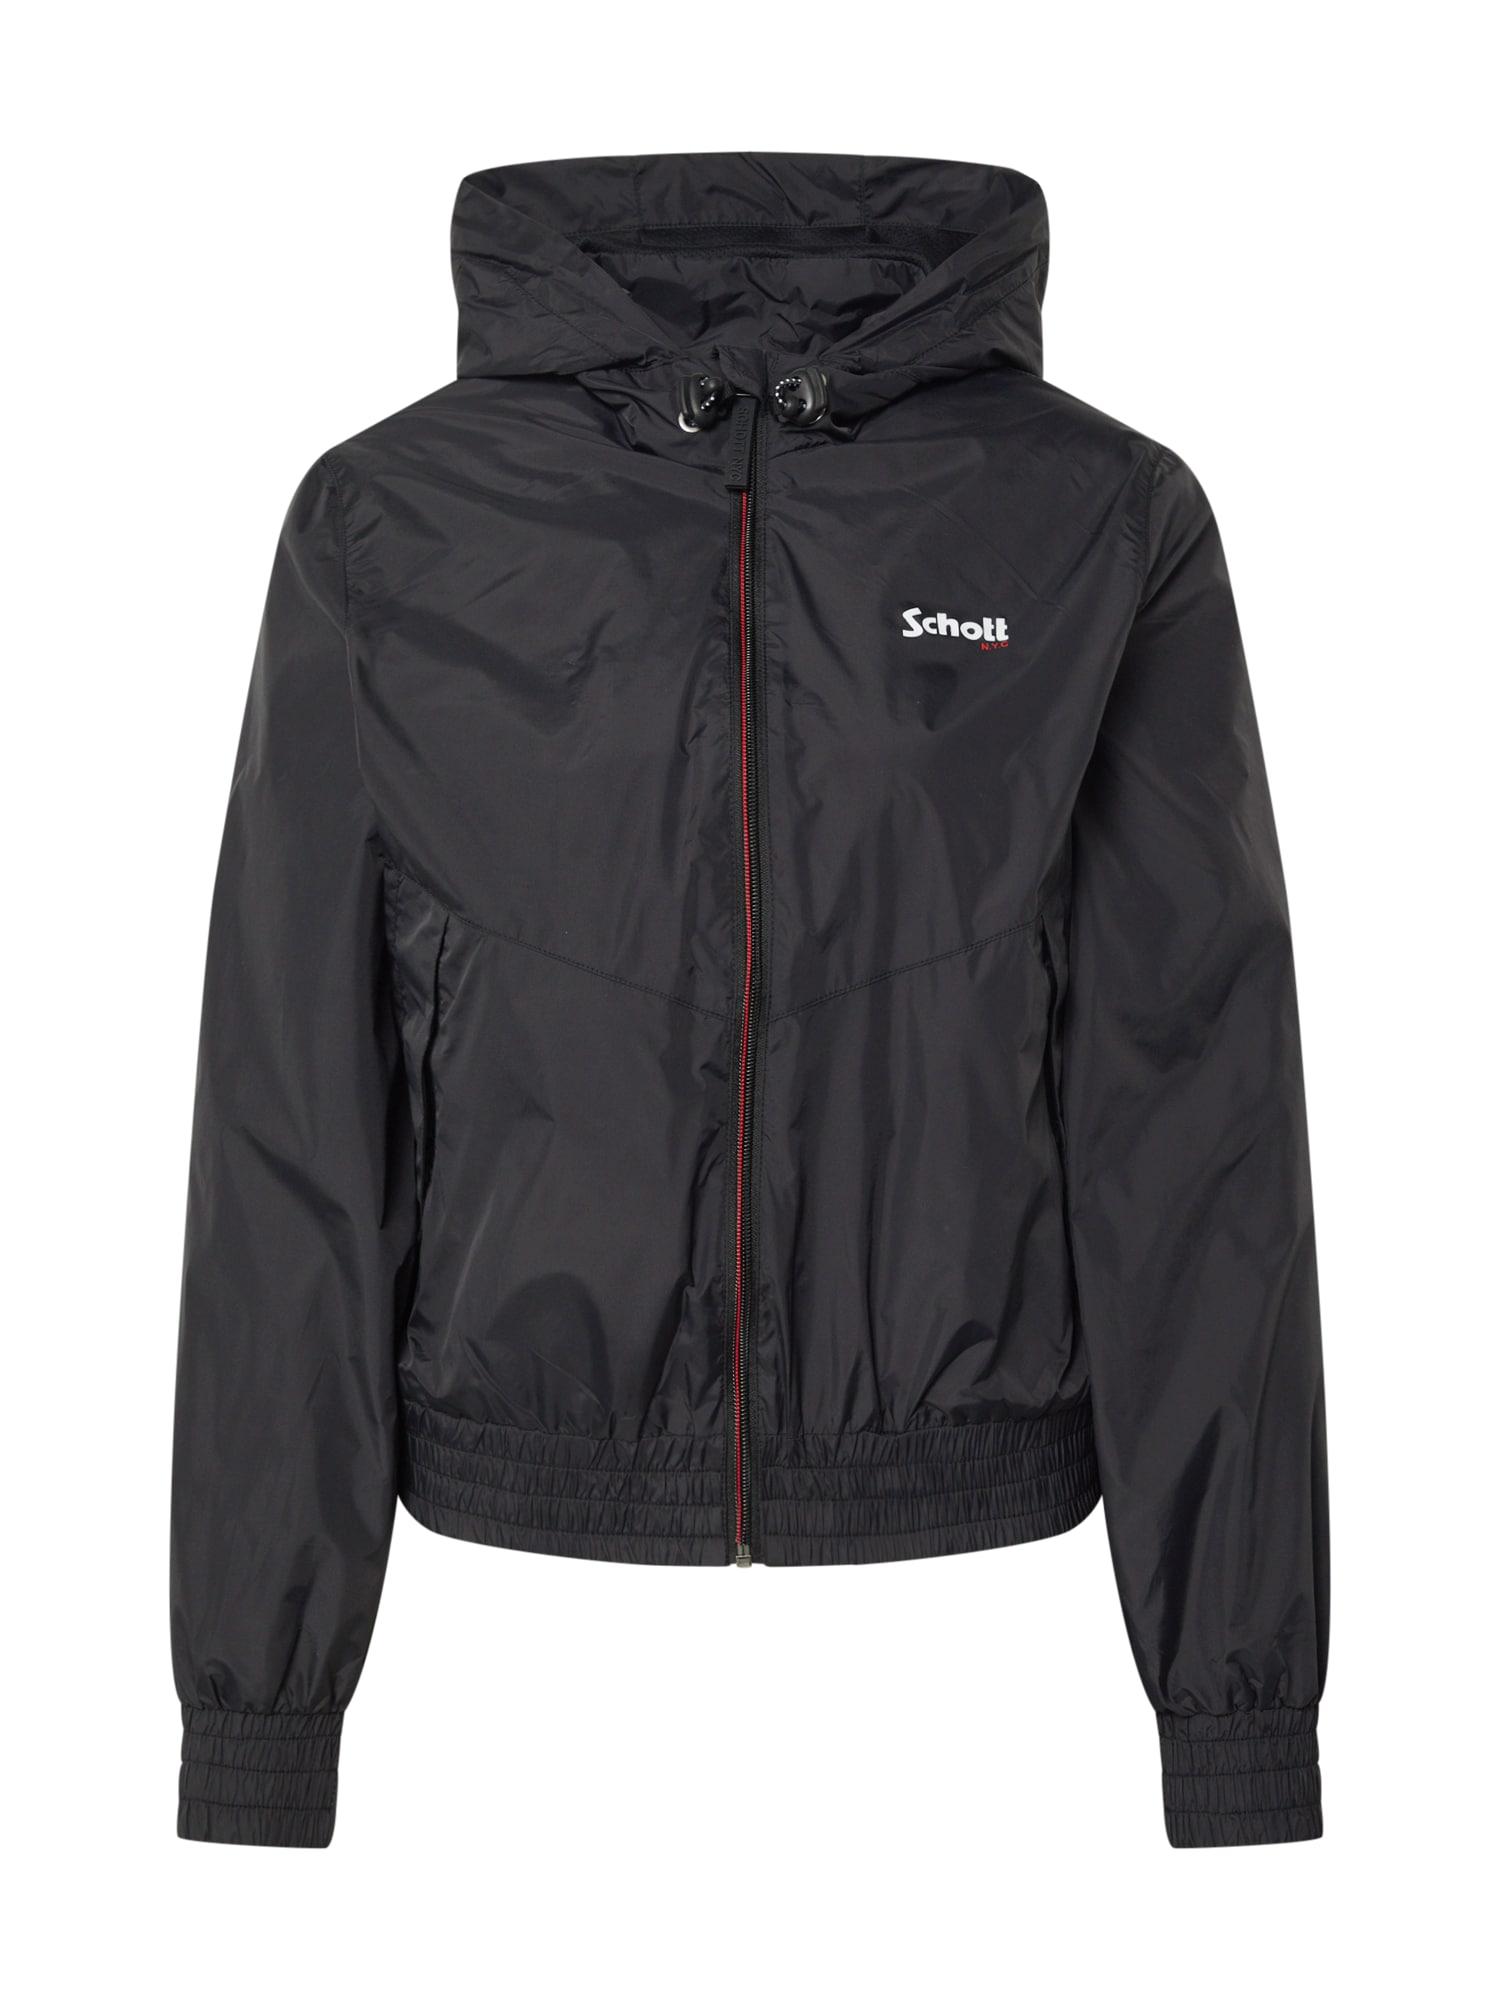 Schott NYC Prechodná bunda 'SCHOTT VESTE A CAPUCHE AVEC EMPIECE'  čierna